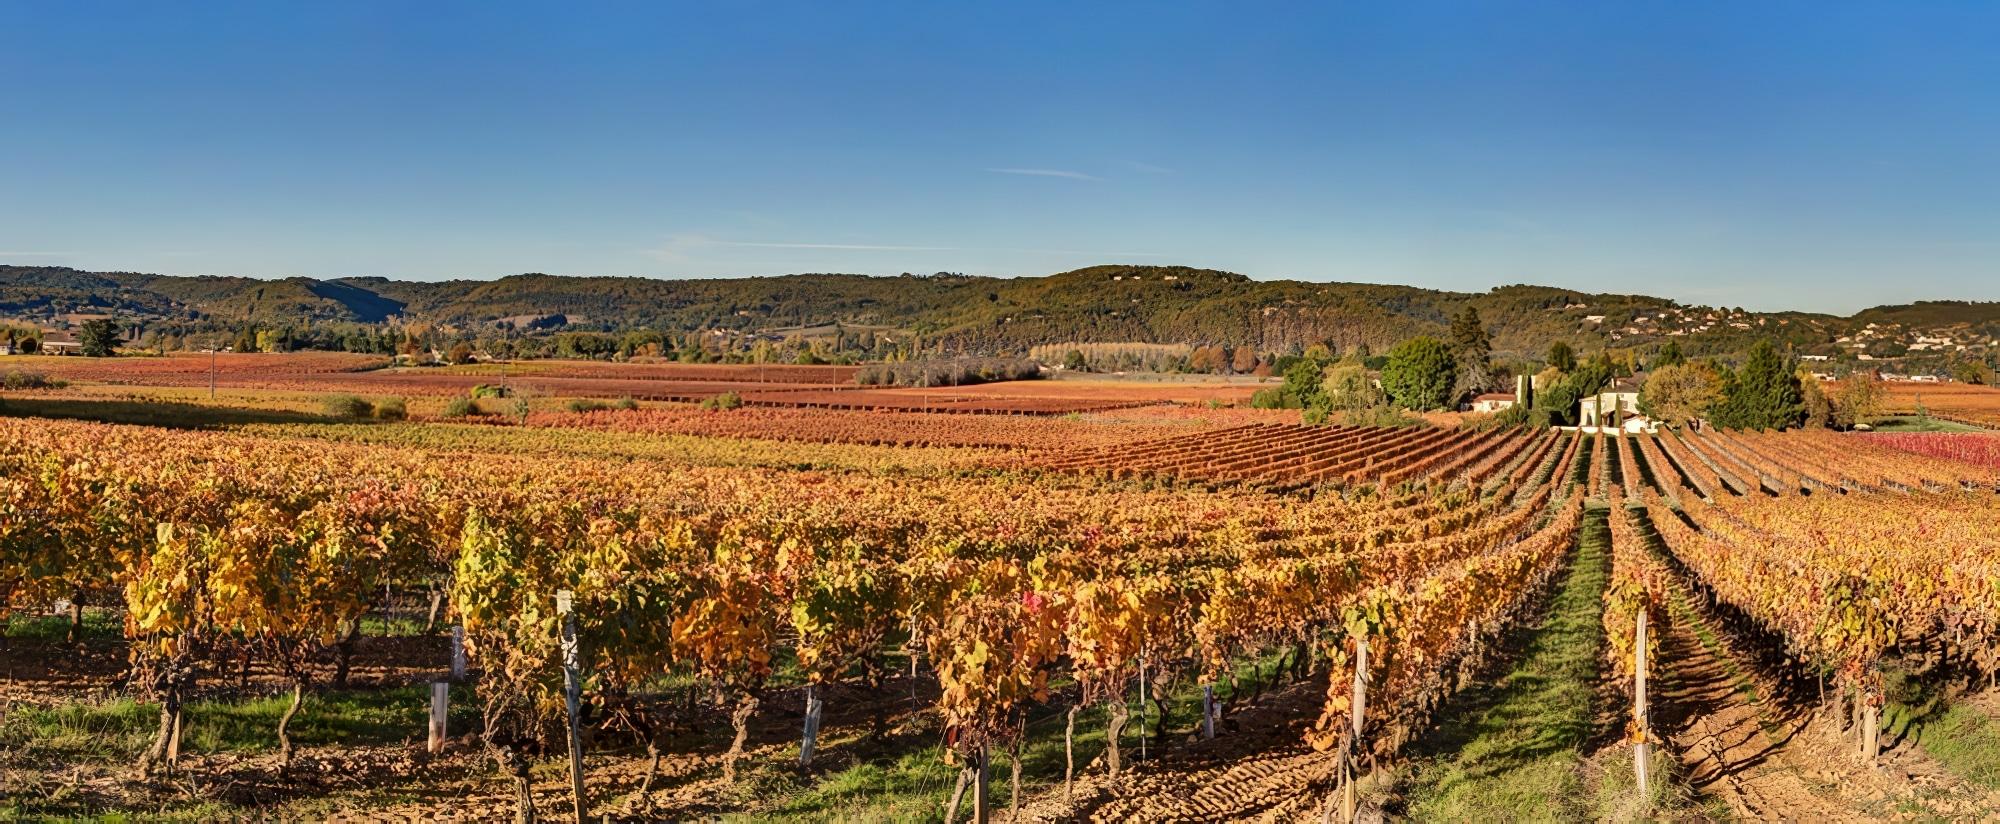 Vignoble, Cahors